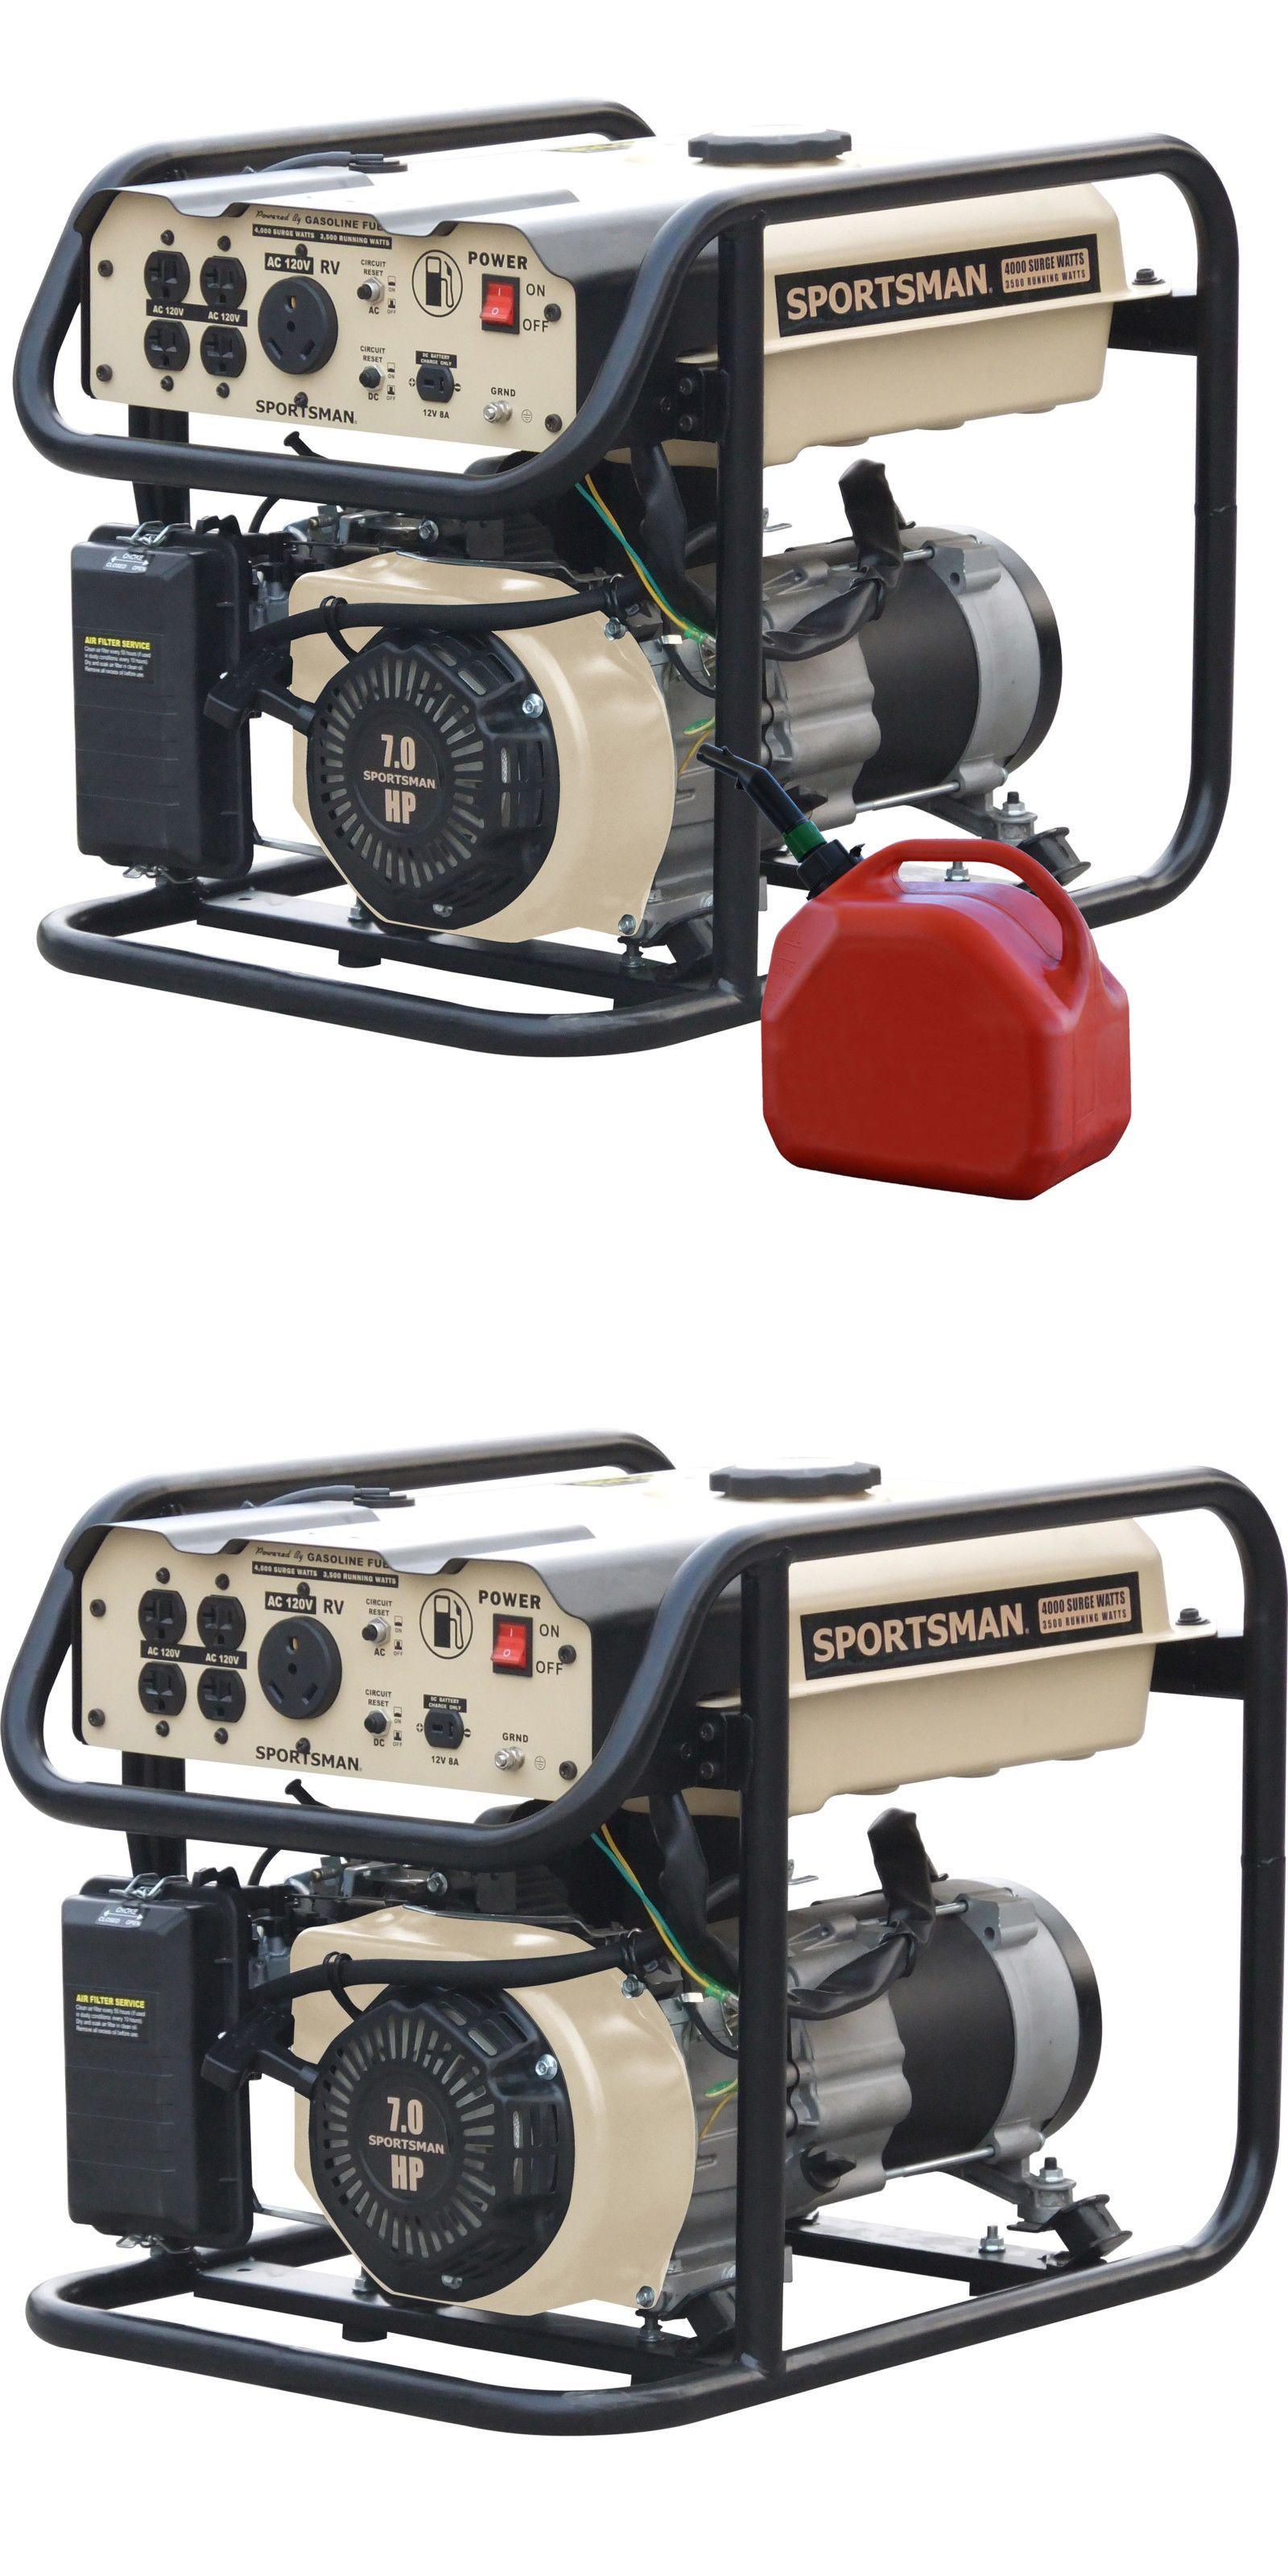 Generators 33082 4000 Watt Generator Gasoline Portable Sportsman Power On Reset Camping Emergency Station Buy It Now Only 24952 Ebay